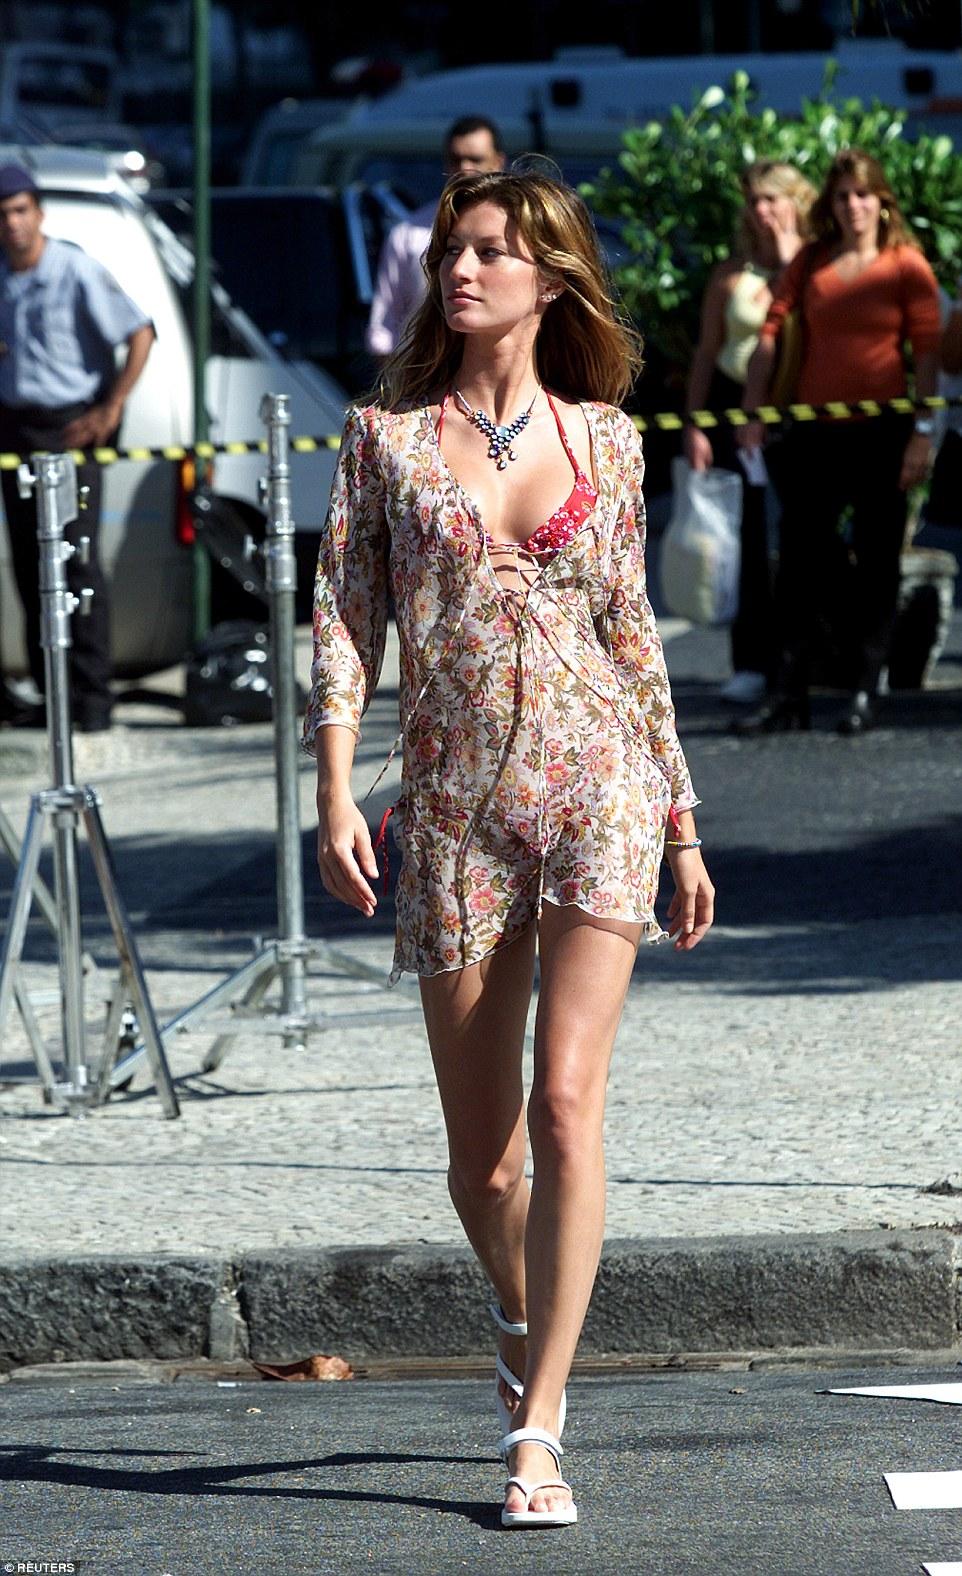 Brazilian supermodel Gisele Bundchen walking down the beachfront at Copacabana, Rio de Janeiro - Copacabana beach has now lost its crown as the city's most fashionable beach to neighbouring Ipanema